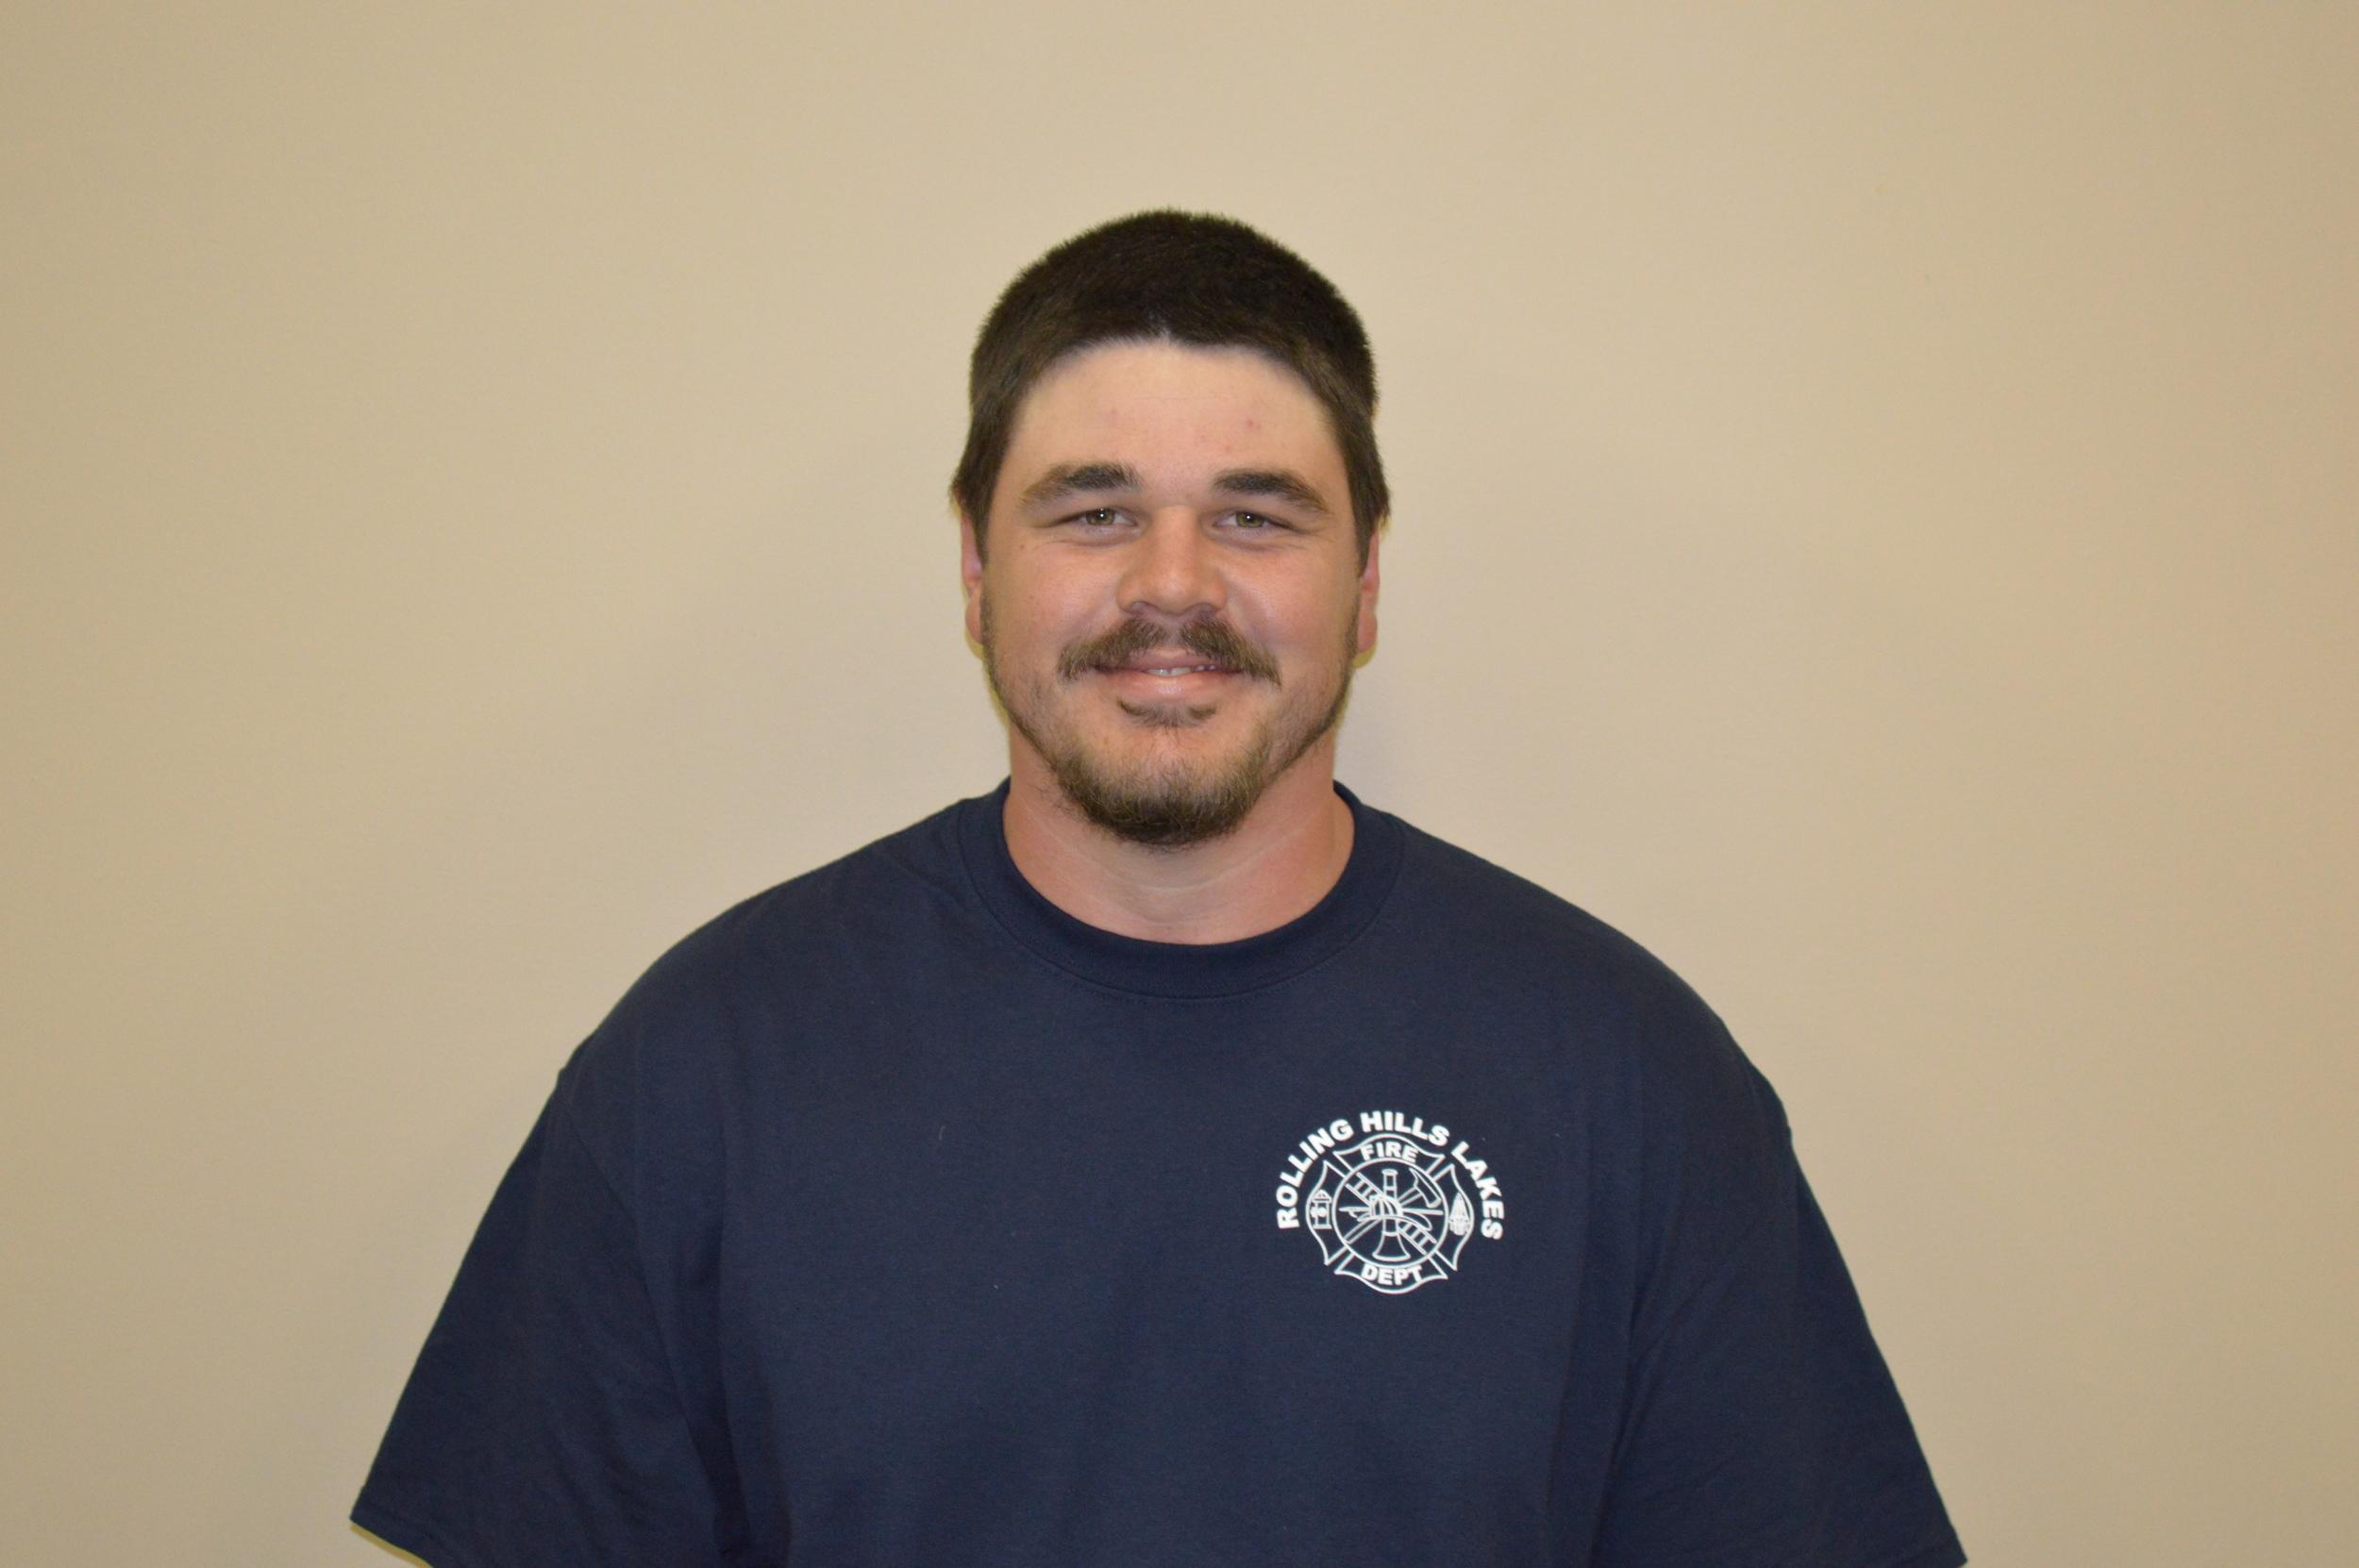 Bud Holmes, Firefighter - 734